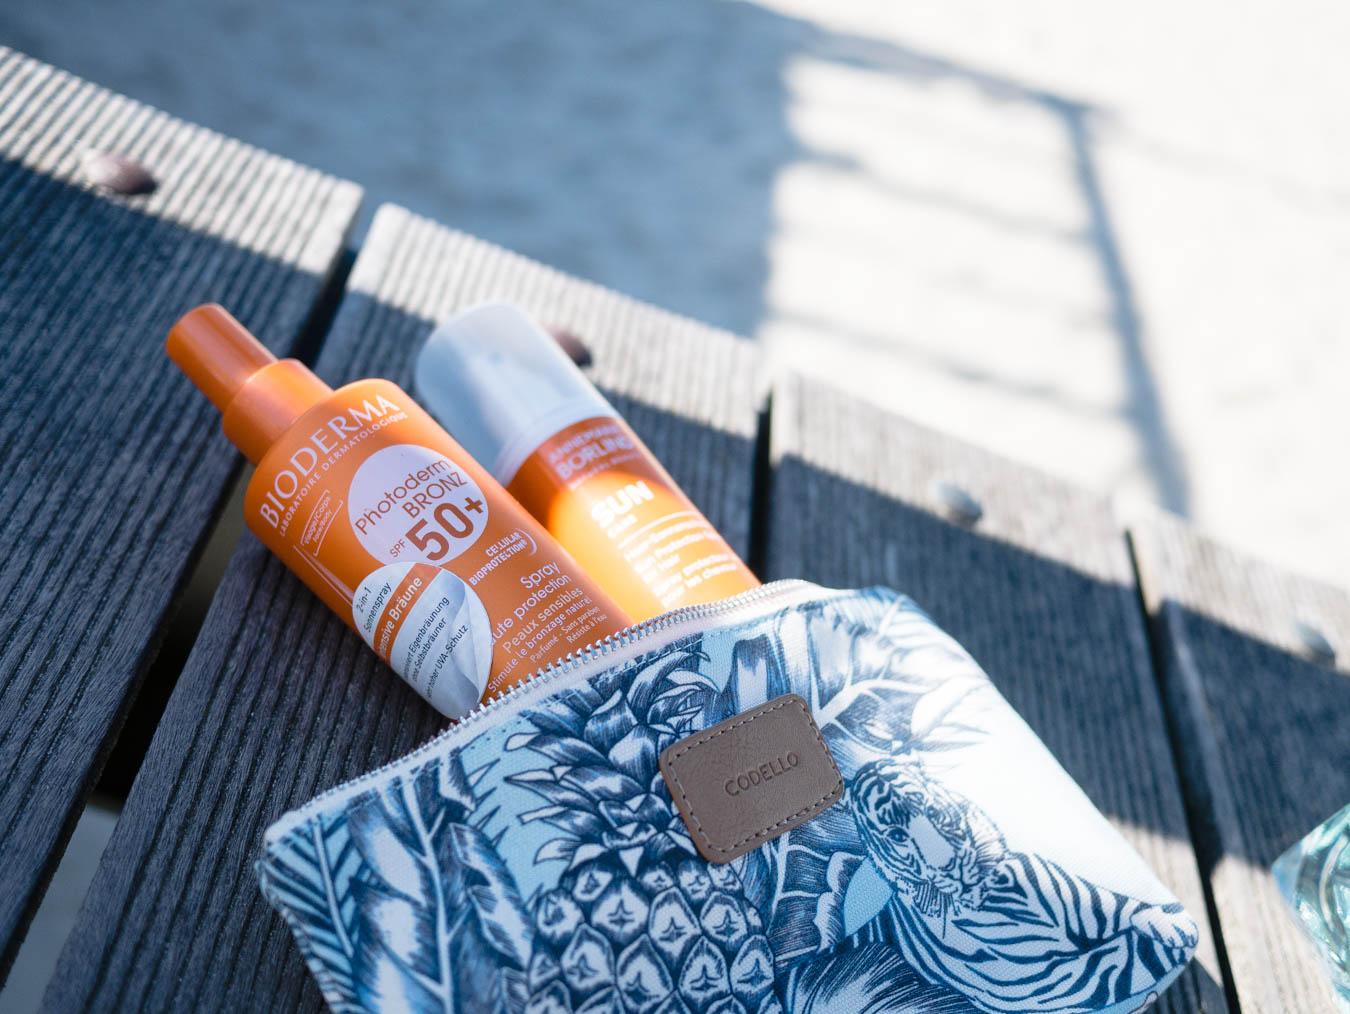 Sonnenpflege Bioderma - Sonnenschutz Haara